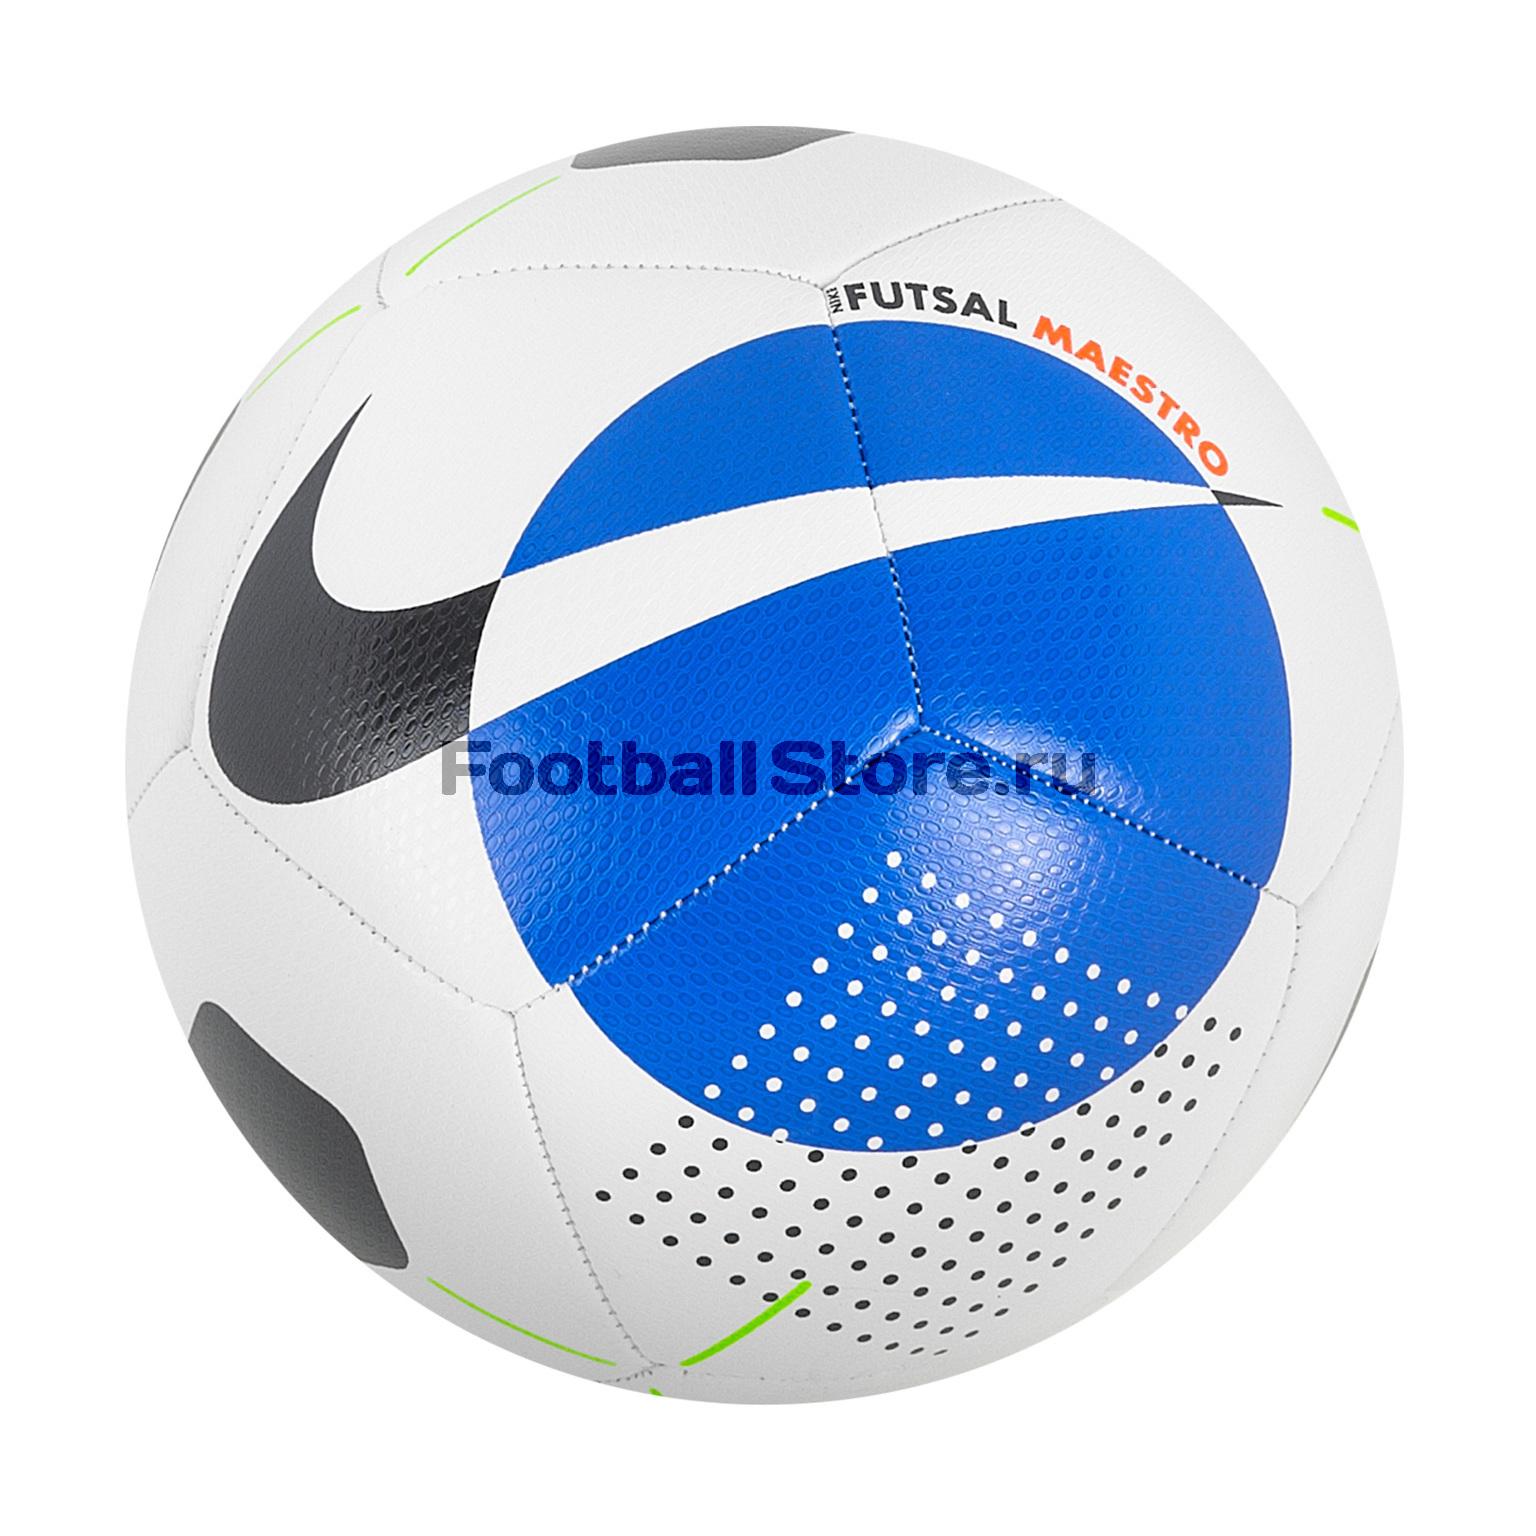 Футзальный мяч Nike Futsal Maestro SC3974-100